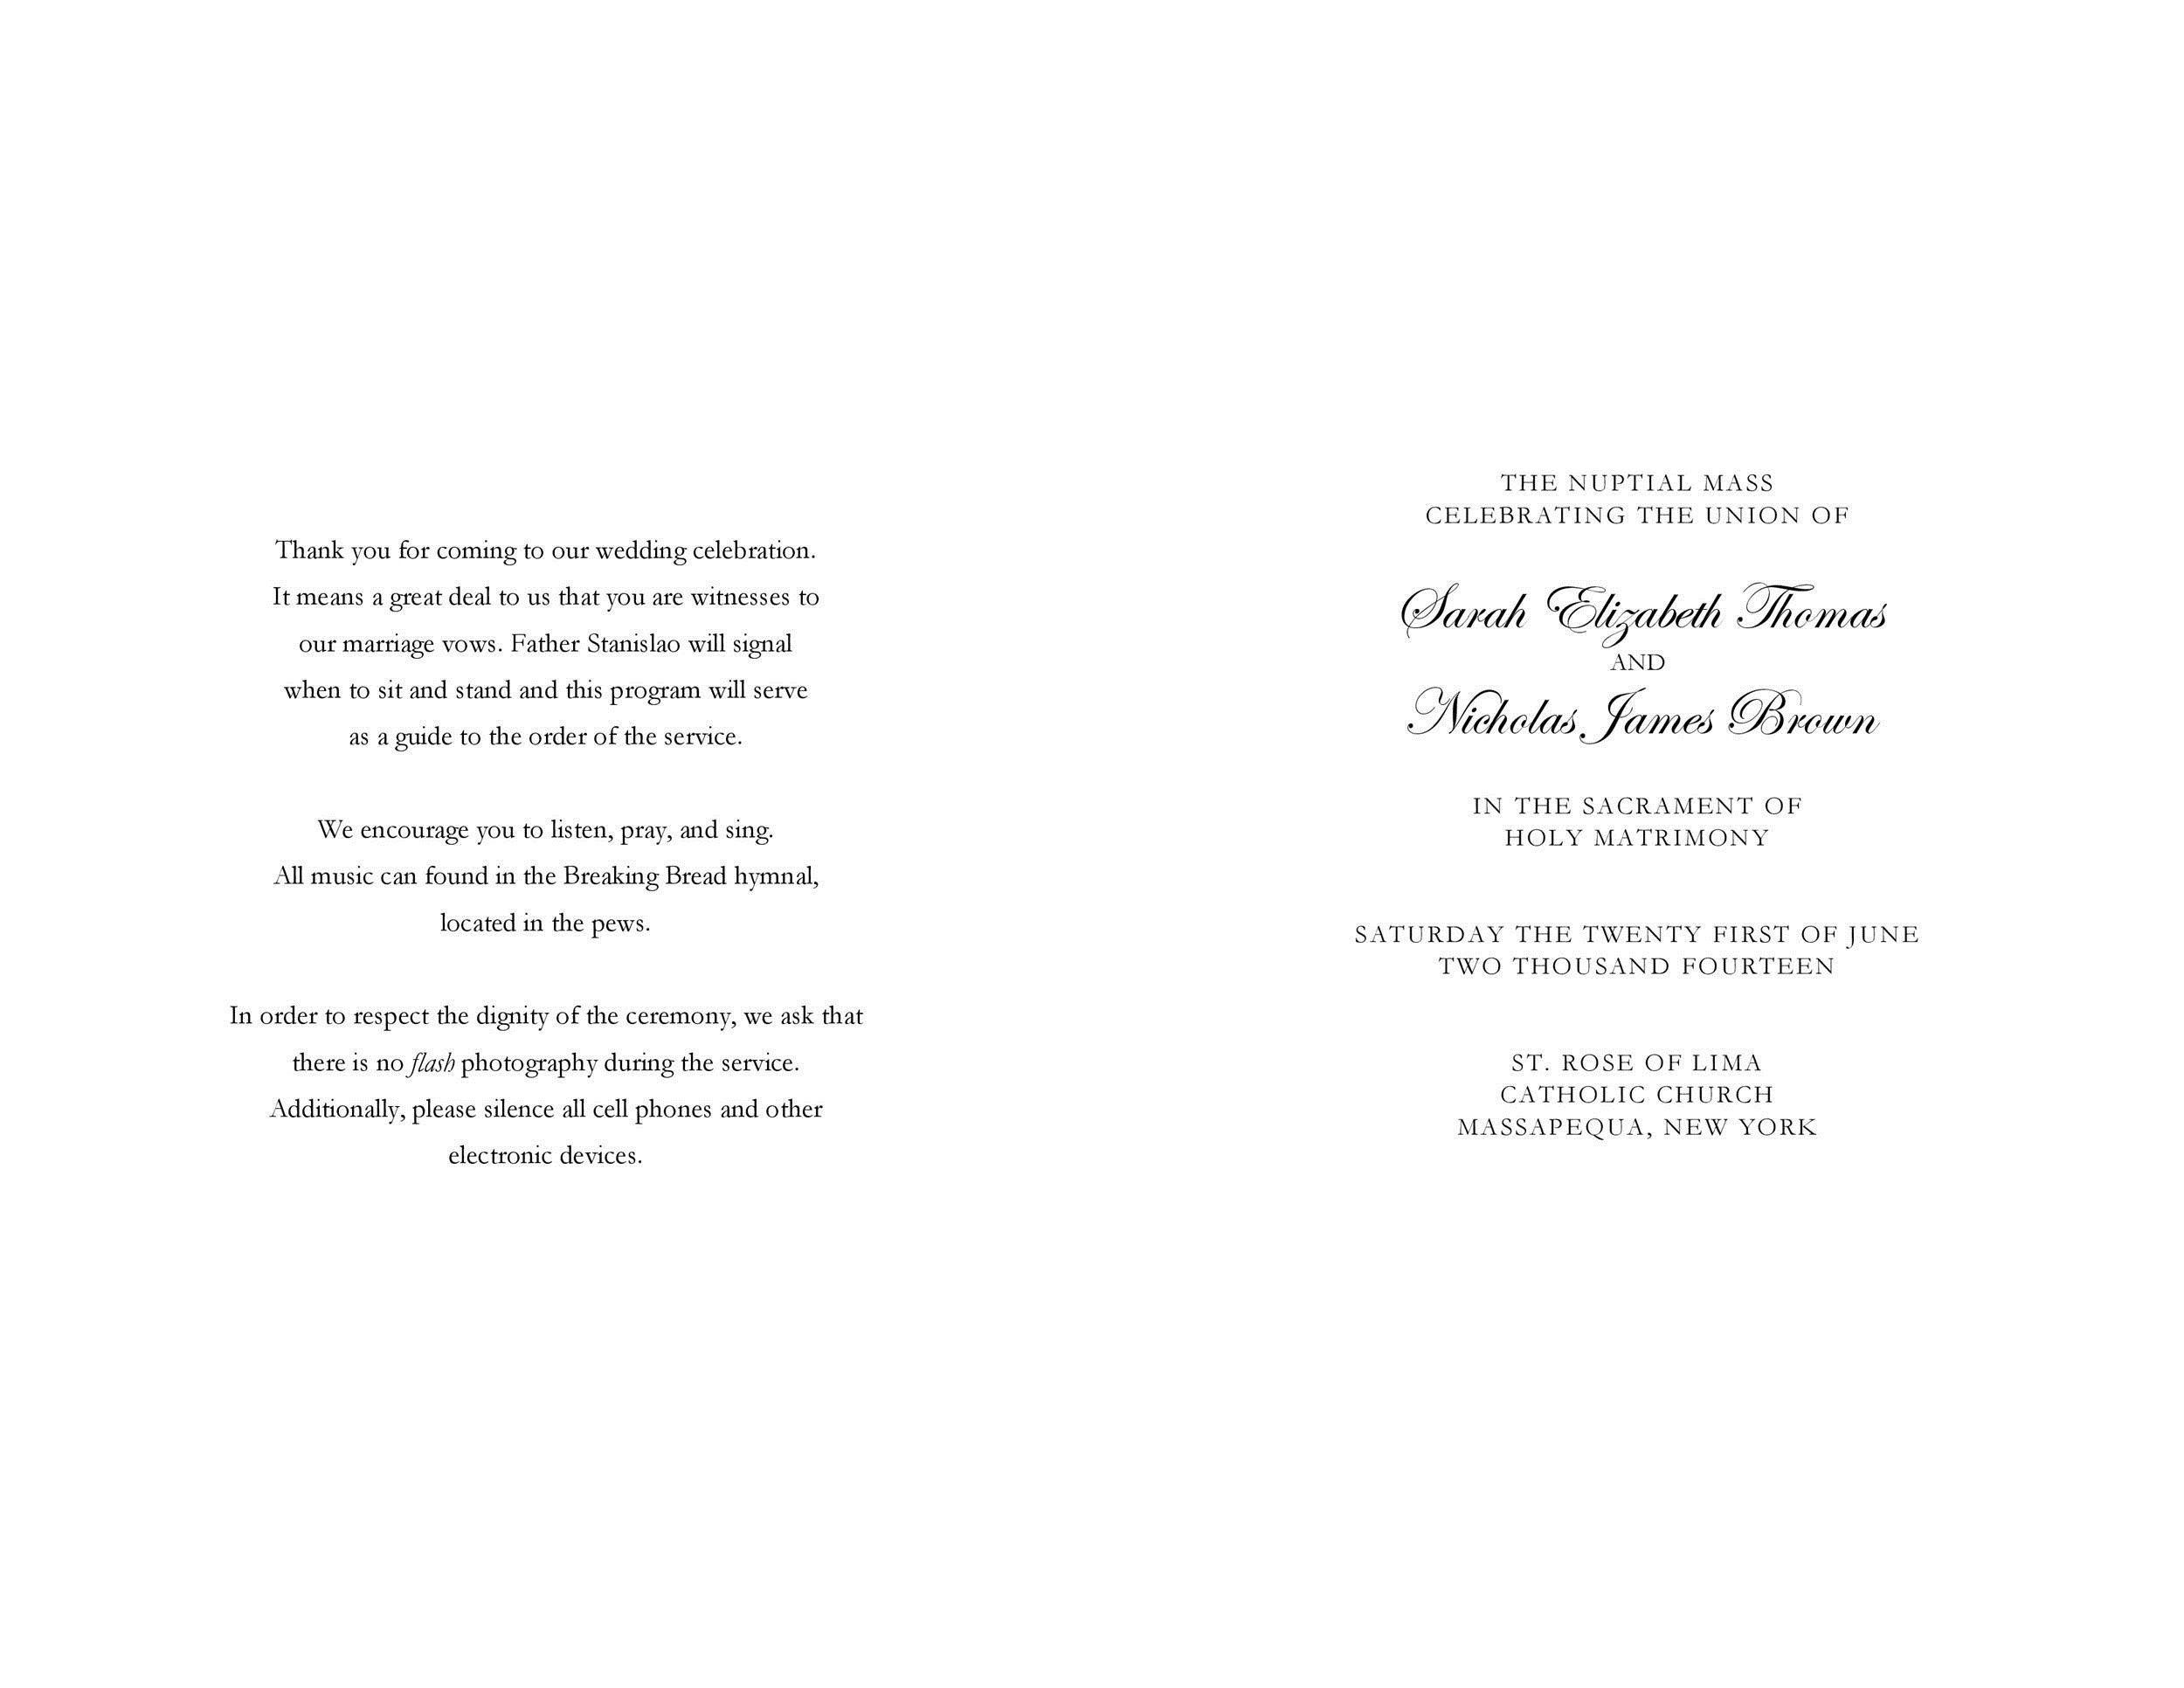 009 Rare Free Wedding Order Of Service Template Word Design  MicrosoftFull